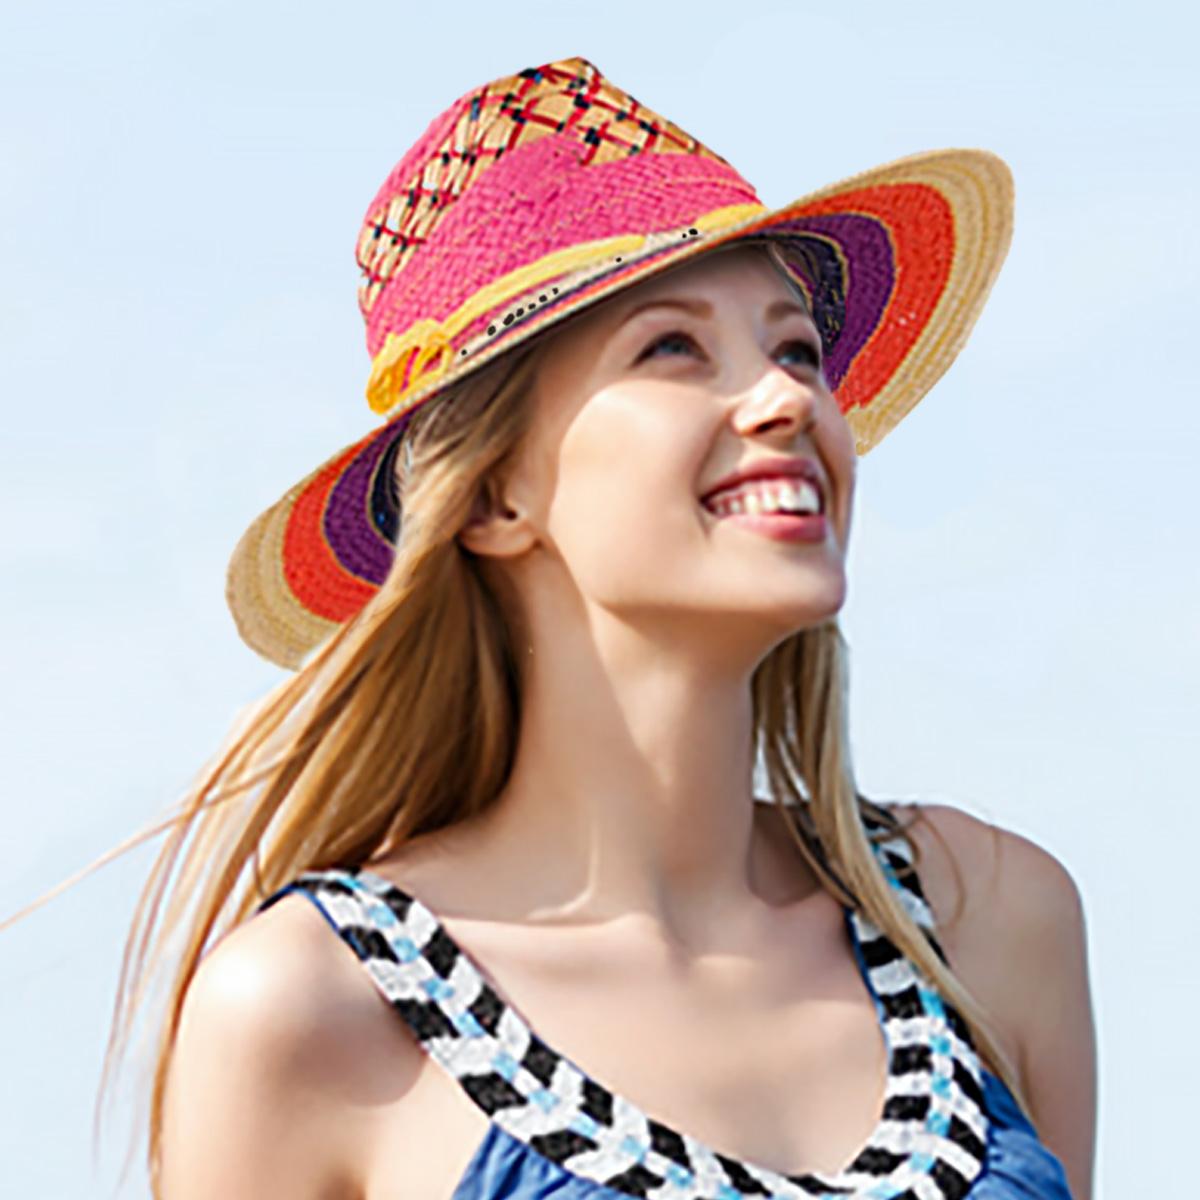 Itallan straw hat